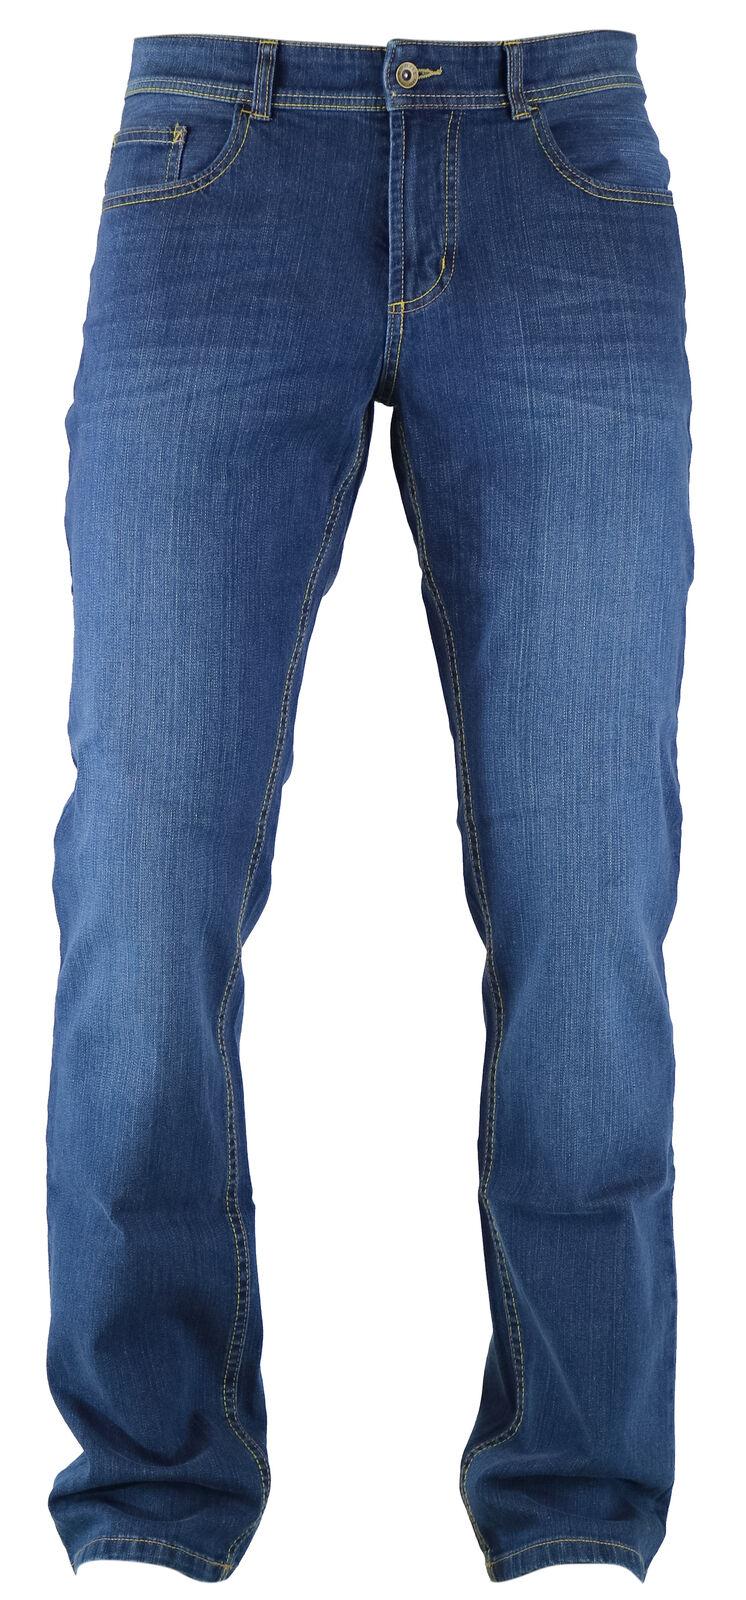 Hattric Hardy Medio bleu Used Look Hombre Five Pocket Denim Vaqueros 688915